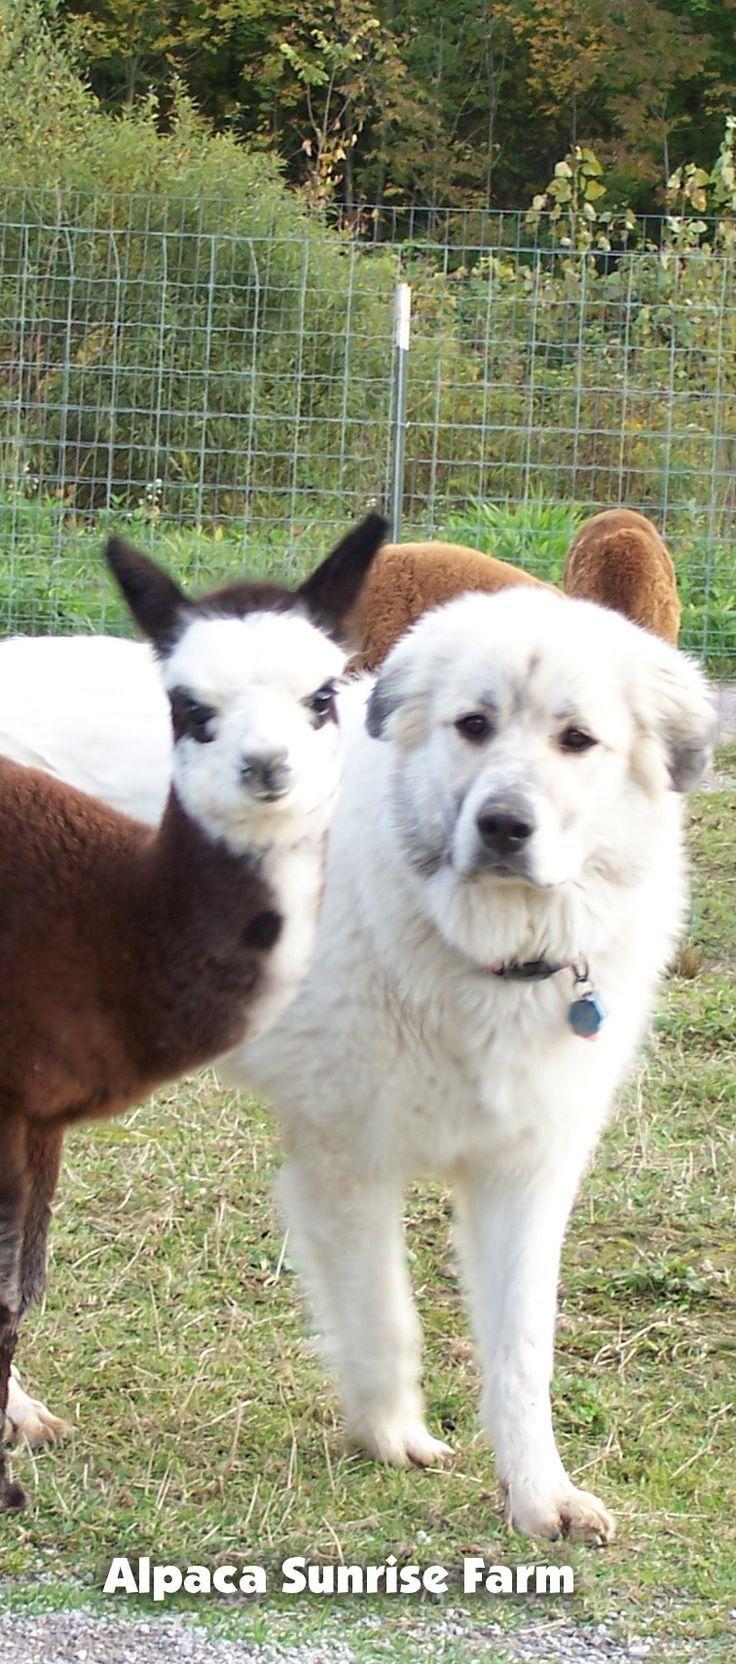 Alpaca Cria And A Great Pyrenees Guard Dog Alpaca Sunrise Farm Is A Full Service Alpaca Farm Since 1998 Alpac Great Pyrenees Pyranees Dog Great Pyrenees Dog